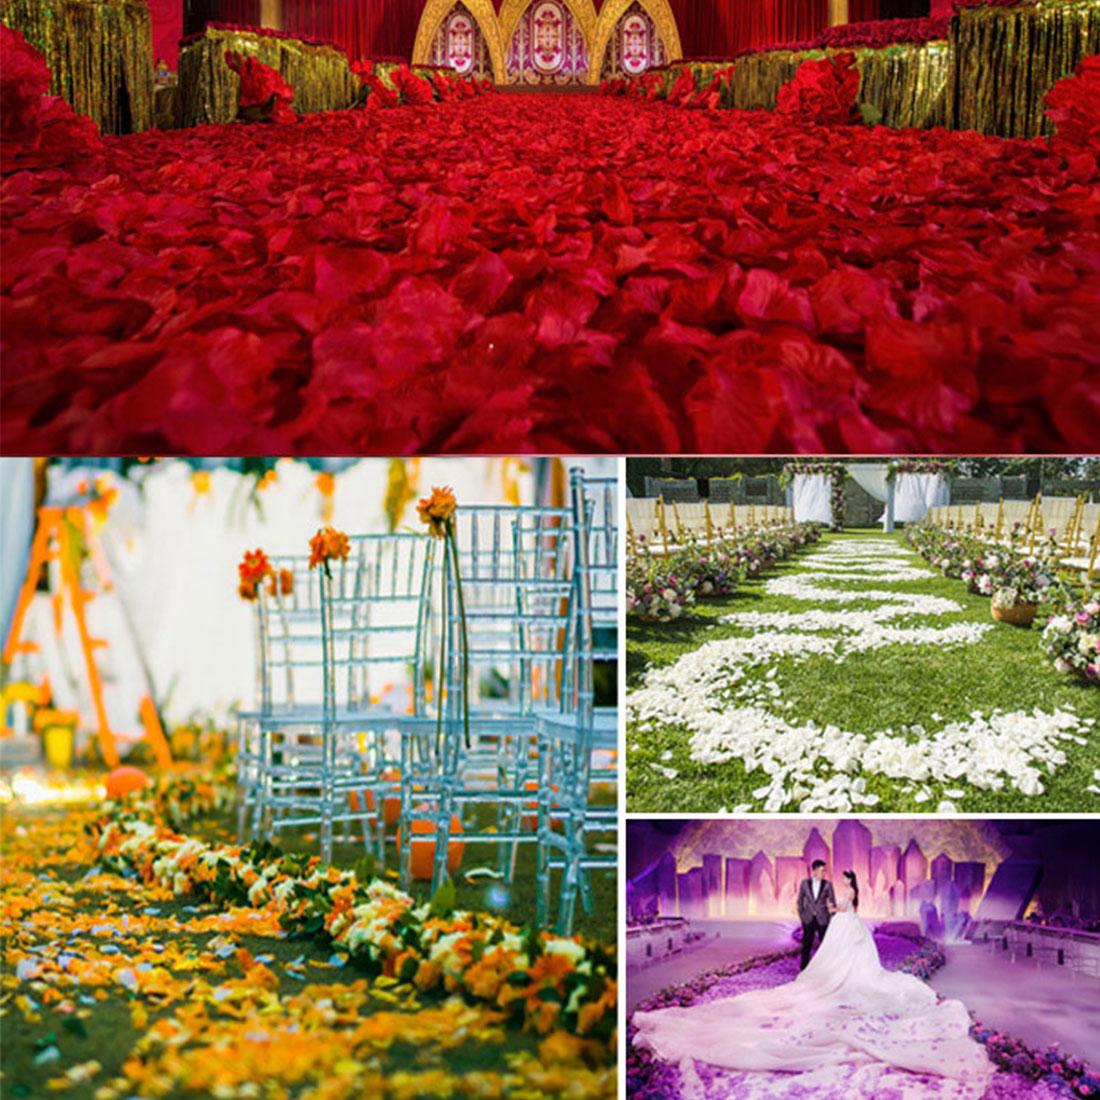 100pcs/lot Wedding Rose Petals Decorations silk Flowers polyester wedding Rose Decor